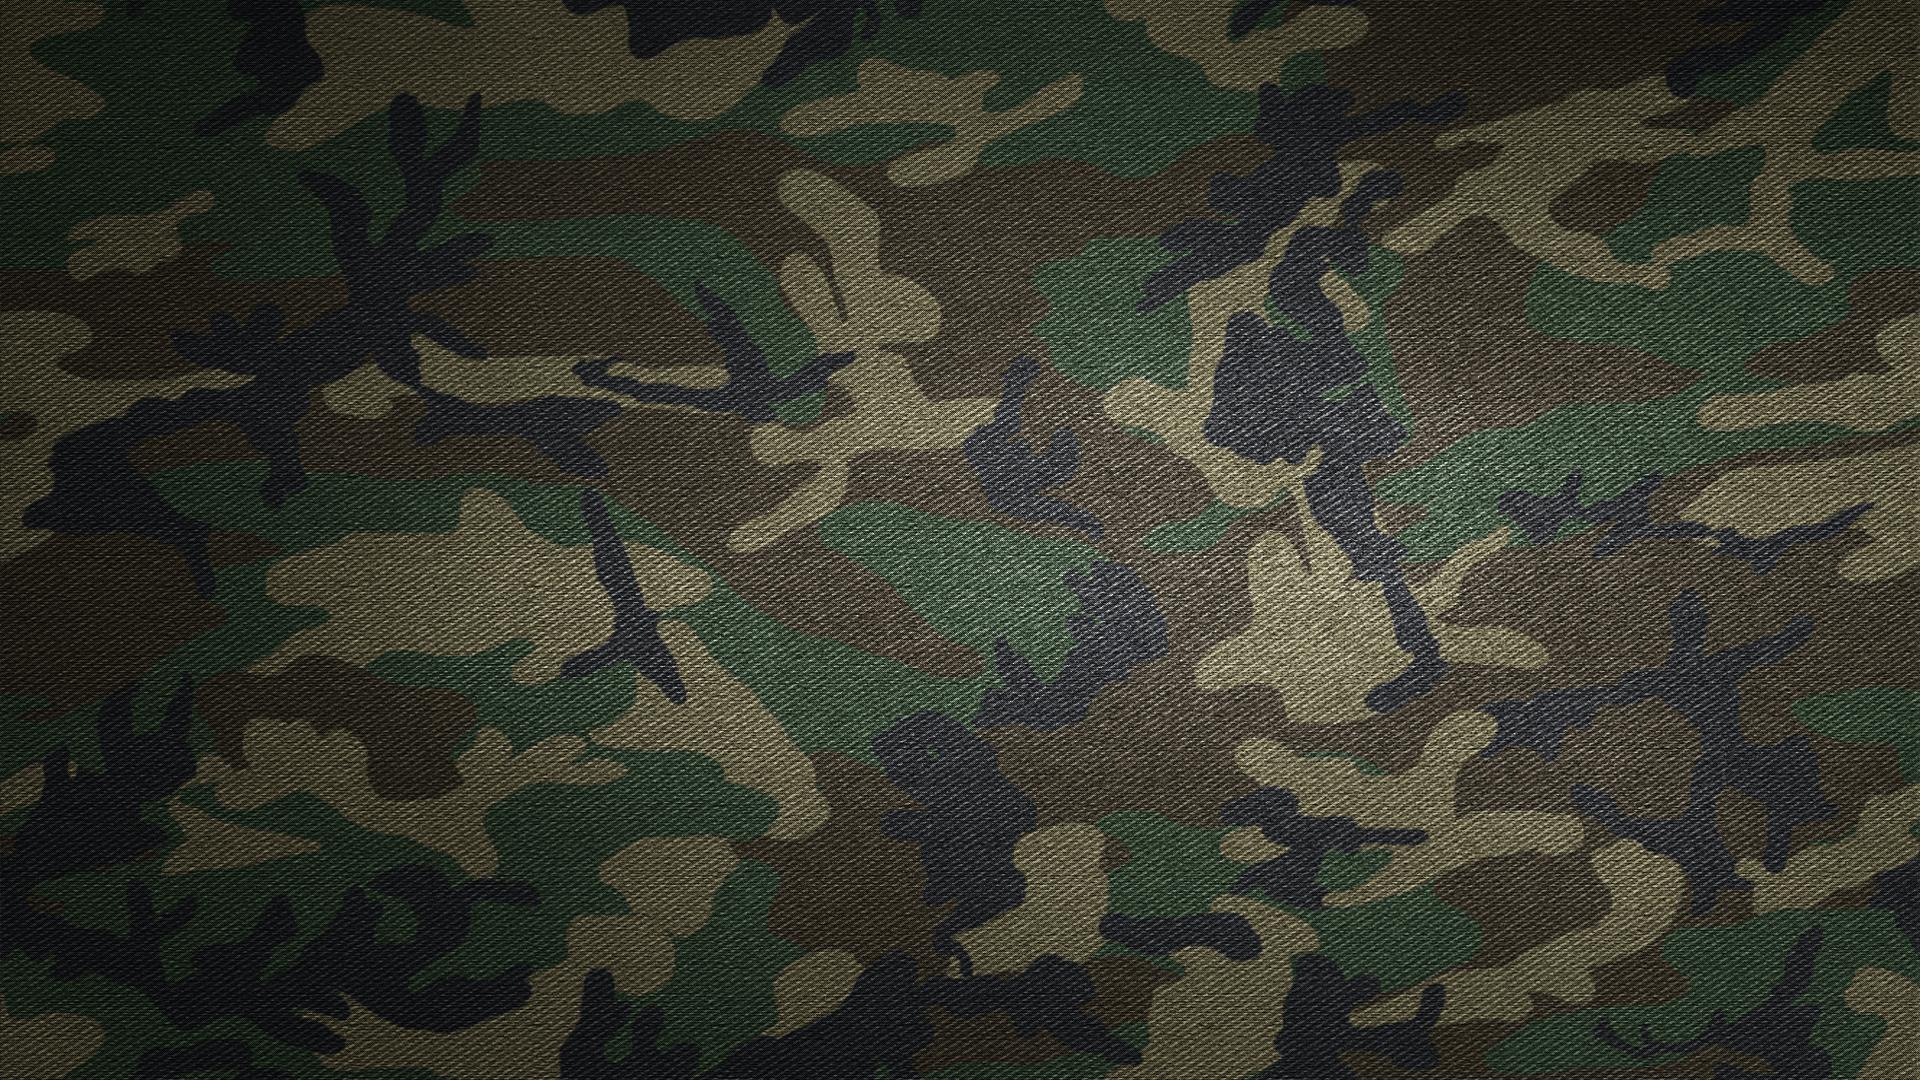 Camouflage Wallpaper   Desktop 1920x1080